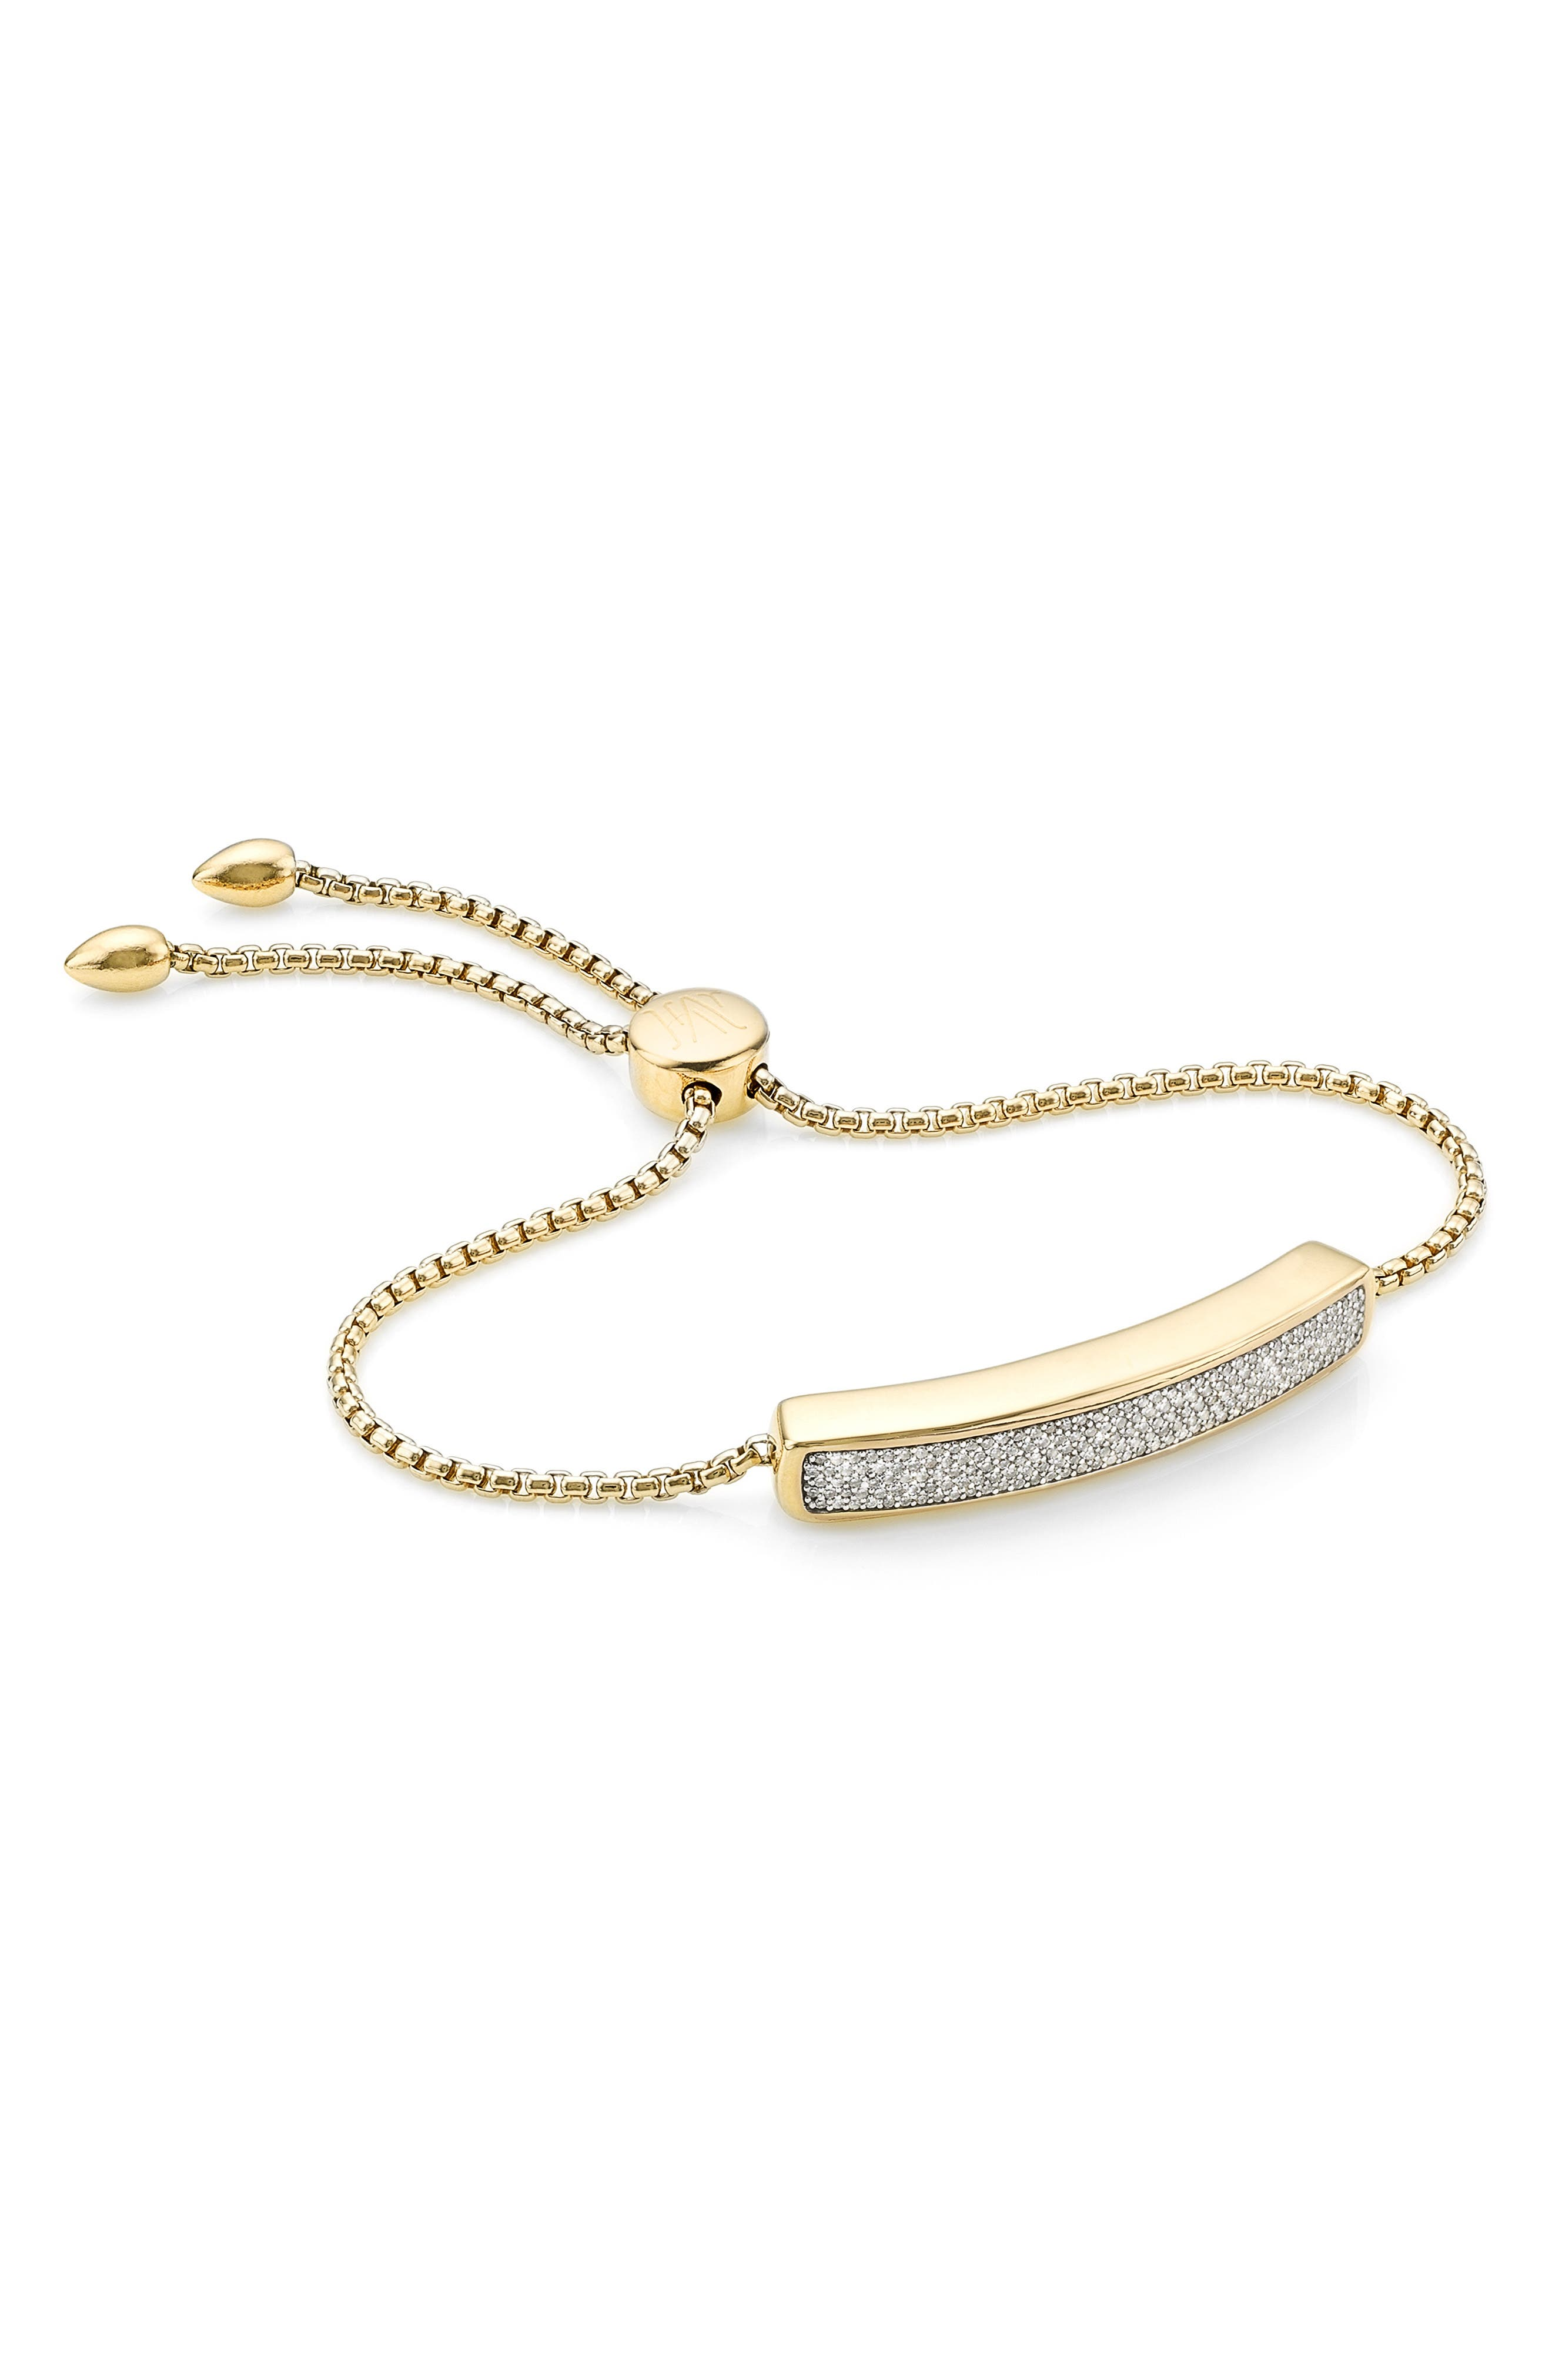 MONICA VINADER Engravable Baja Diamond Bracelet, Main, color, YELLOW GOLD/ DIAMOND